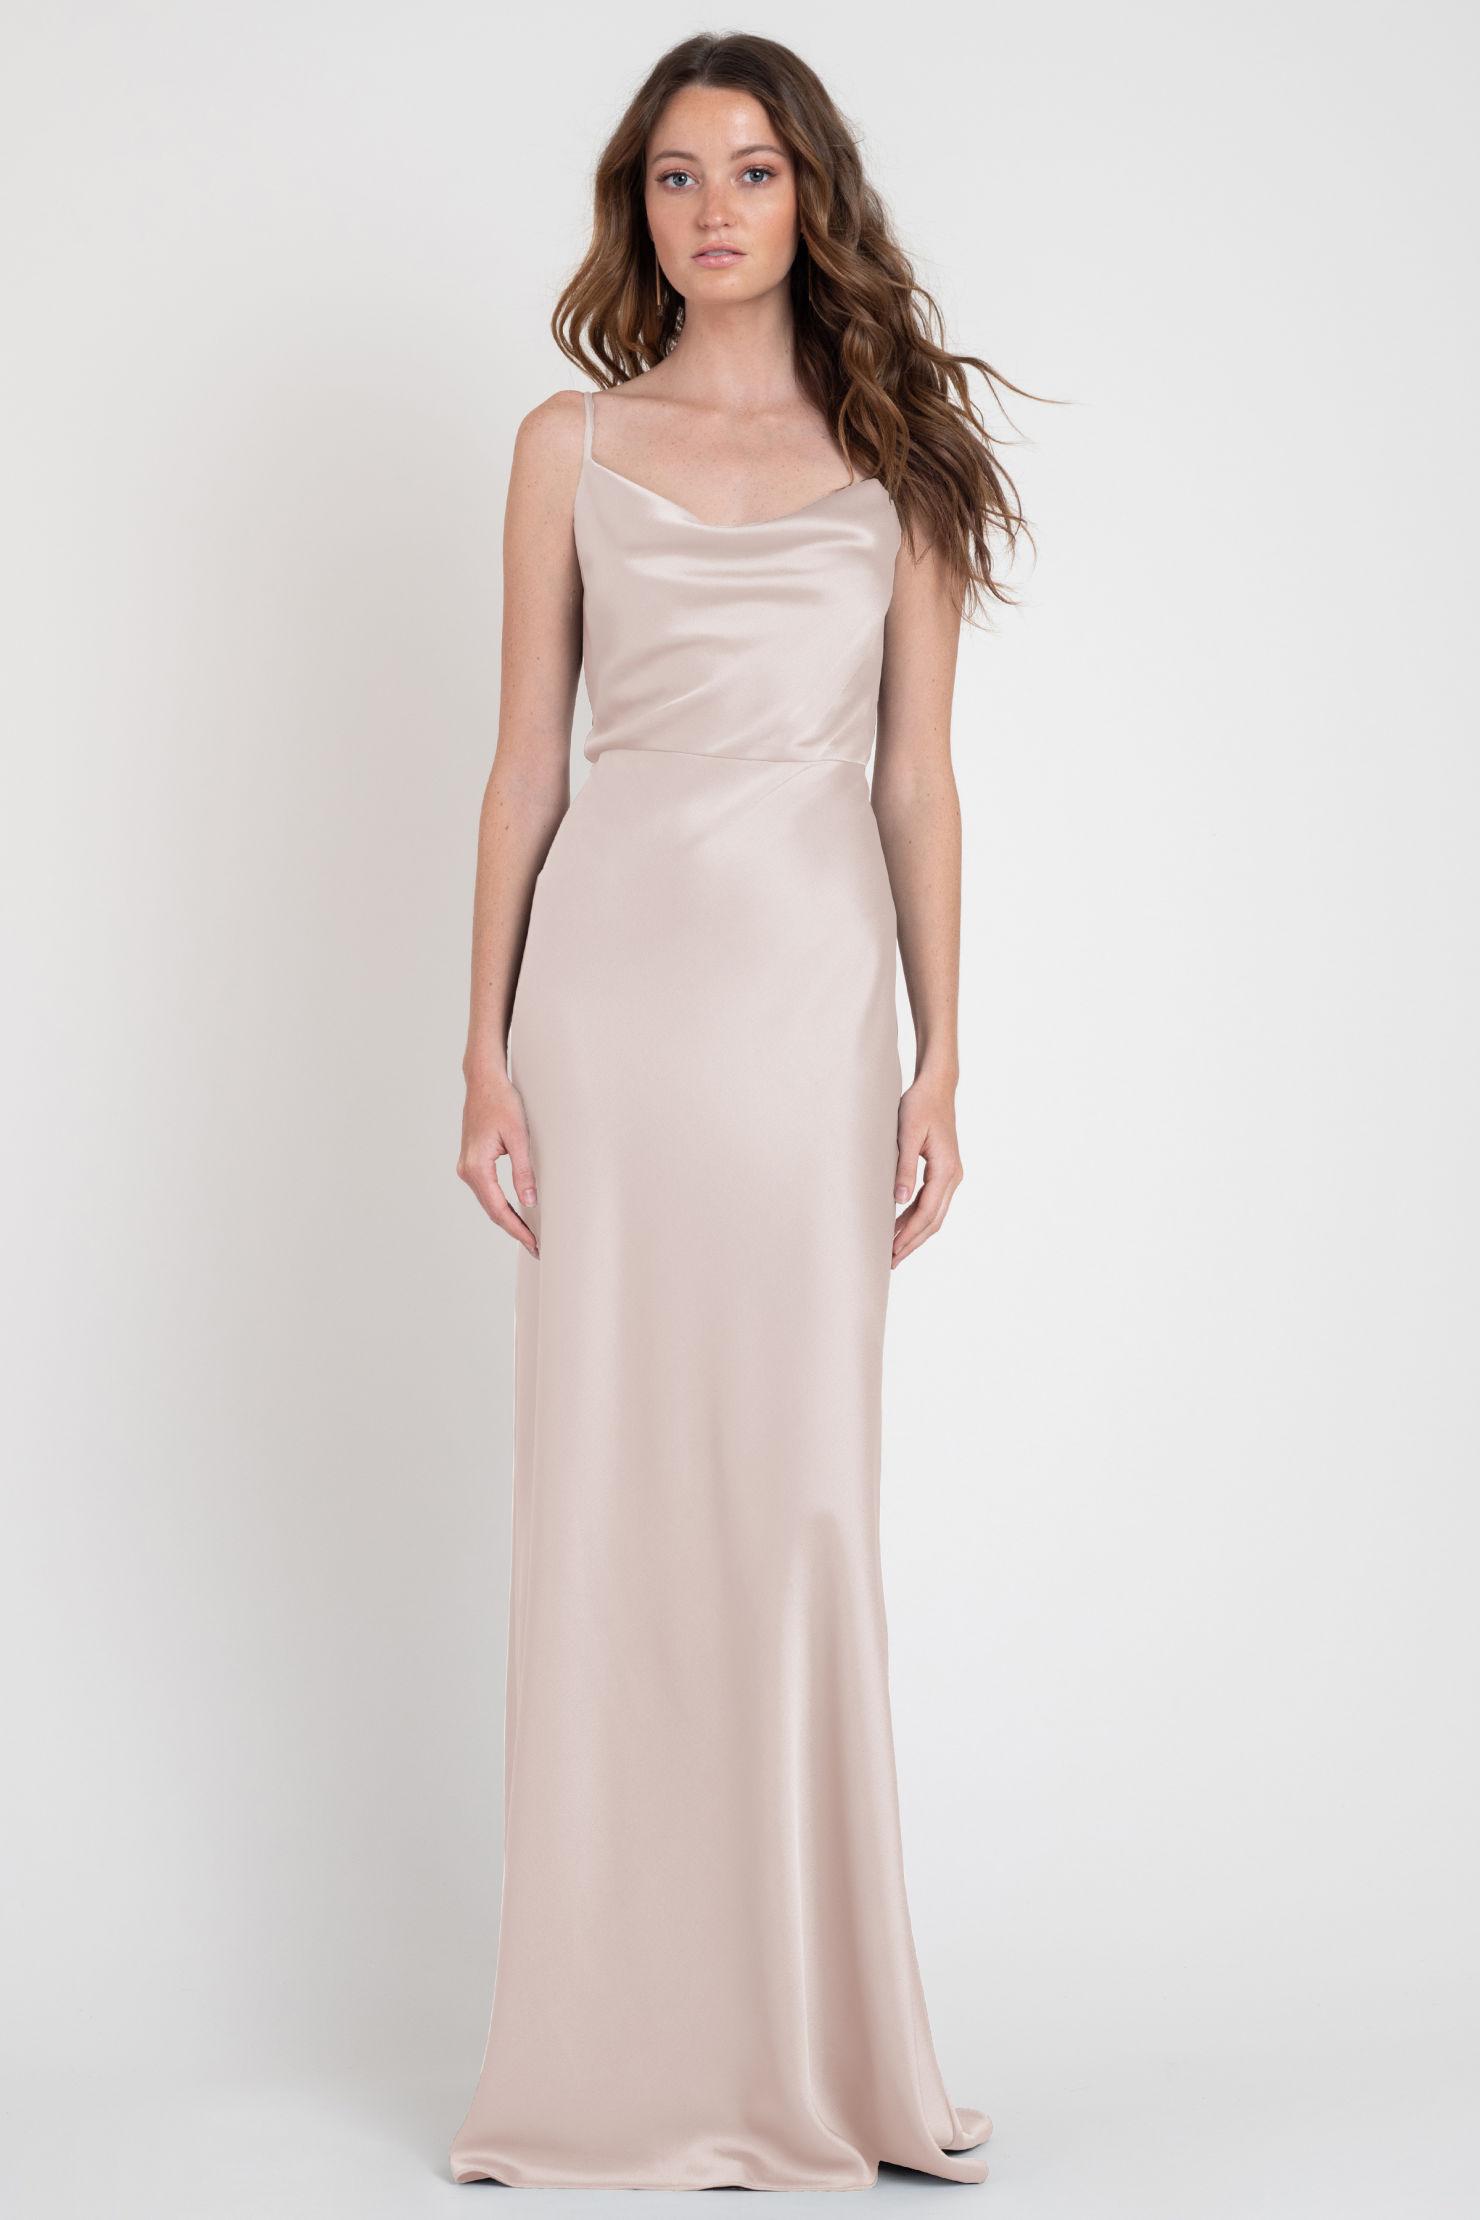 Sylvie Bridesmaids Dress by Jenny Yoo - Prosecco